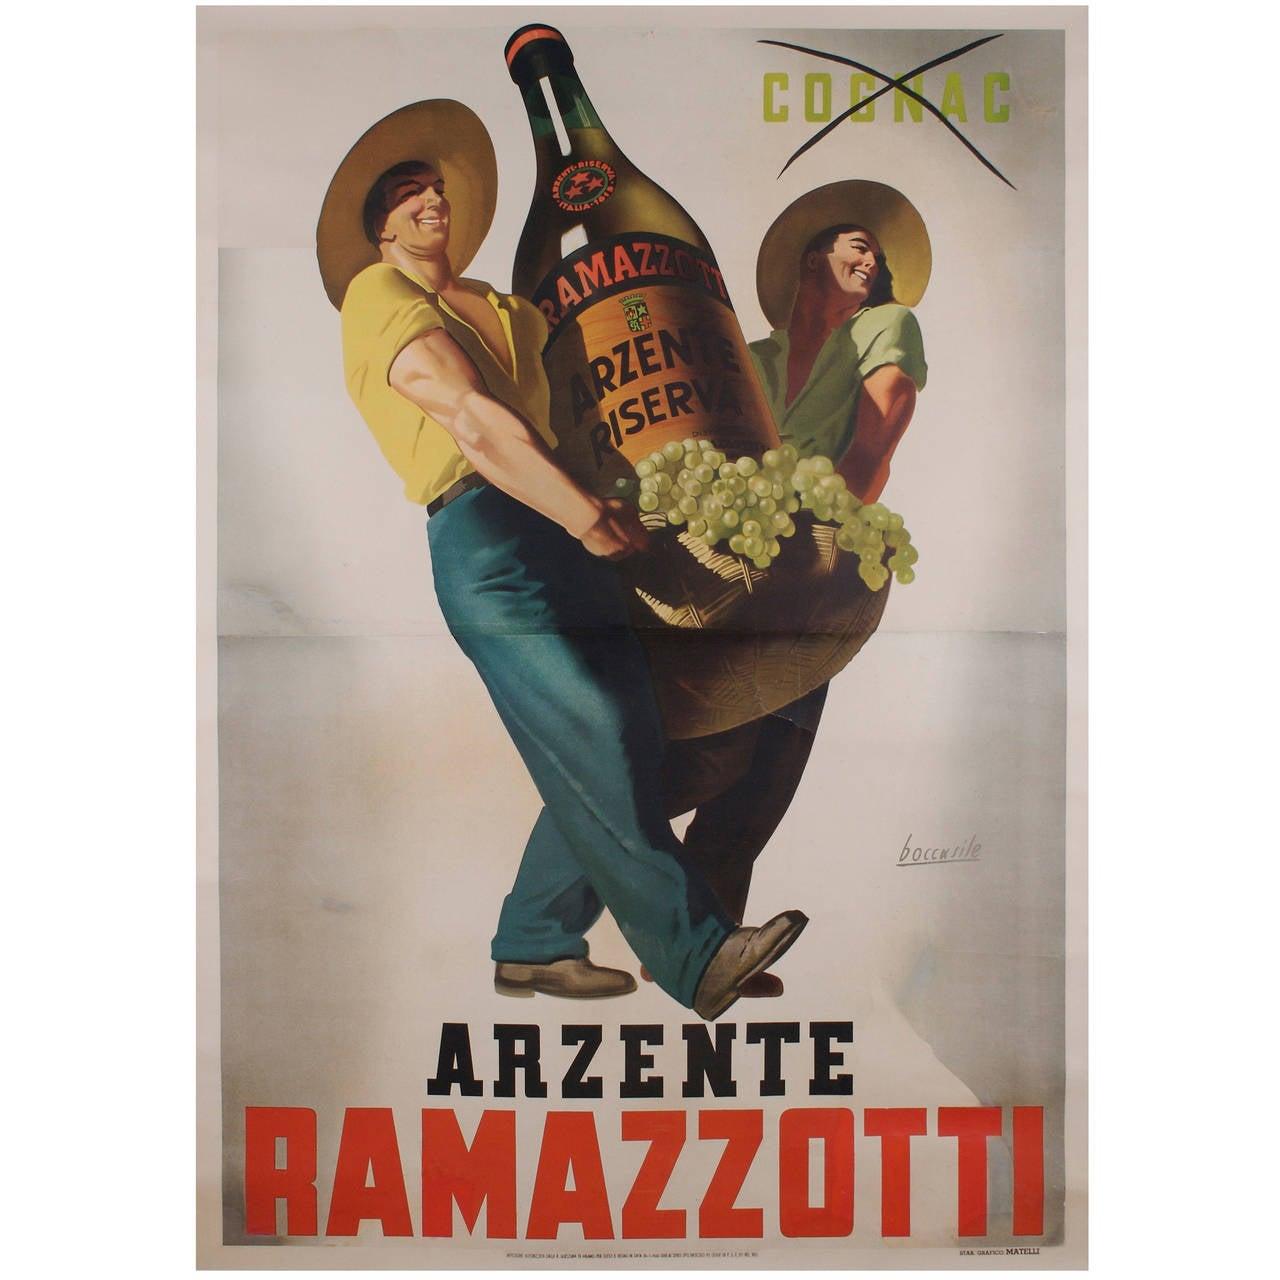 Large Italian Liquor Poster by Gino Boccasile, circa 1940 1